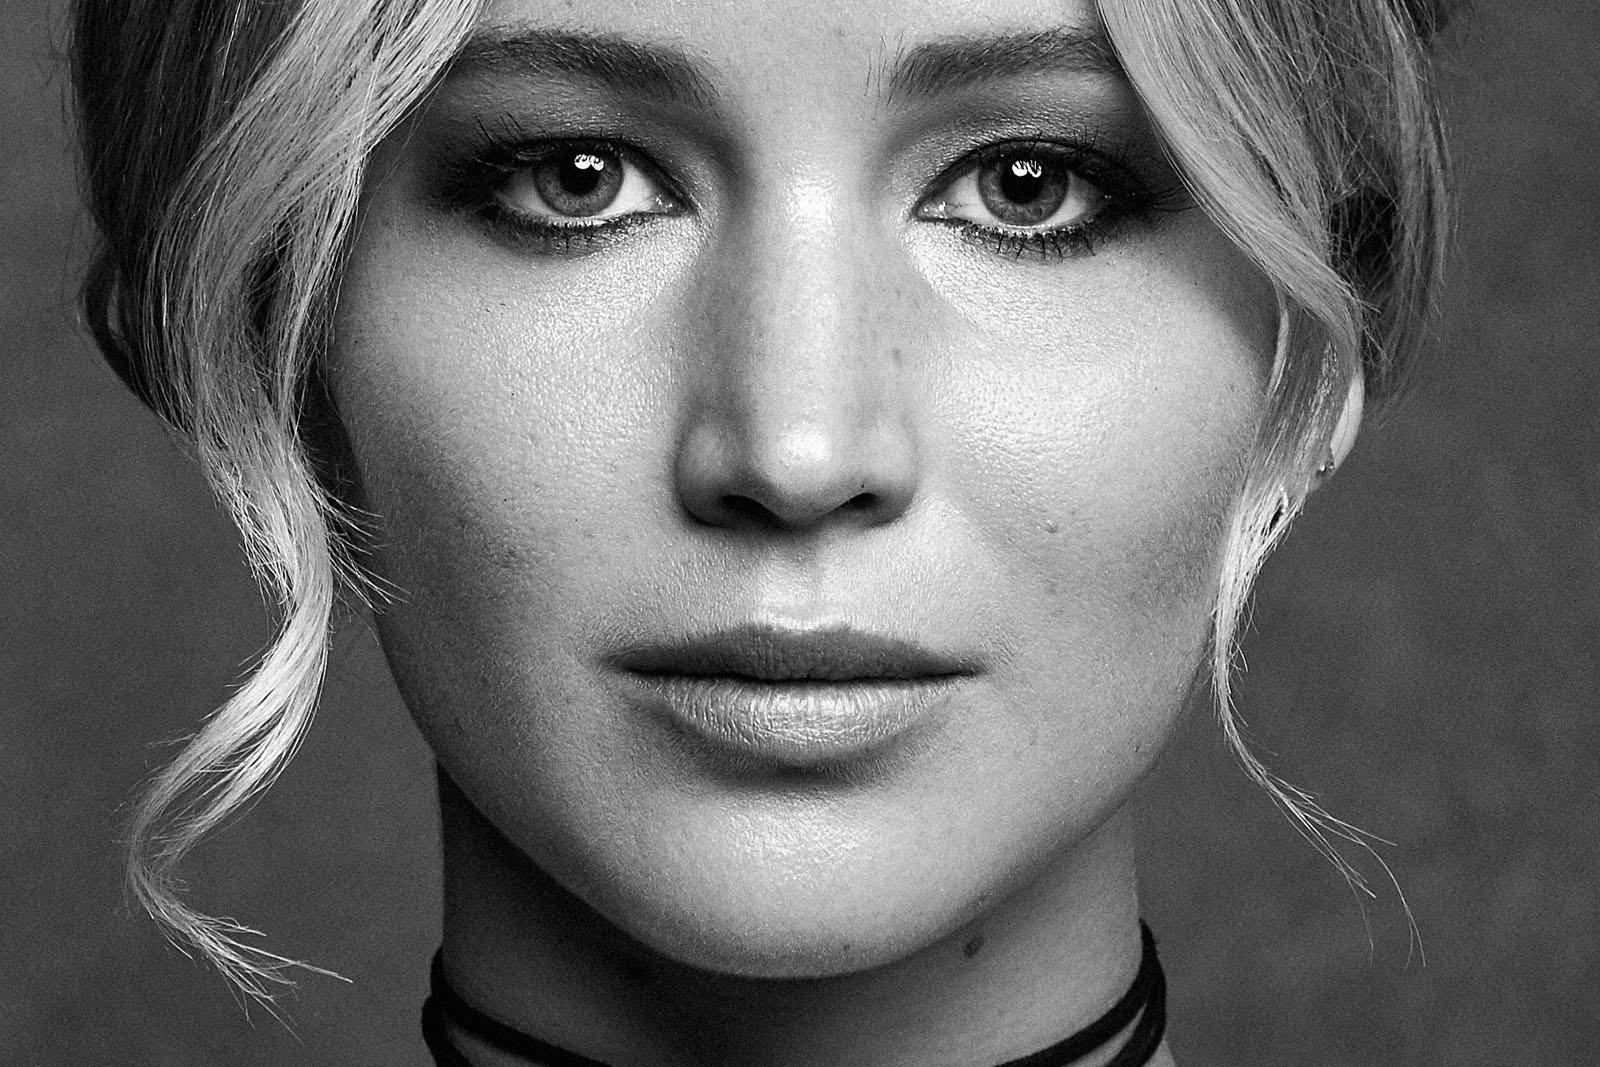 Photographing Jennifer Lawrence